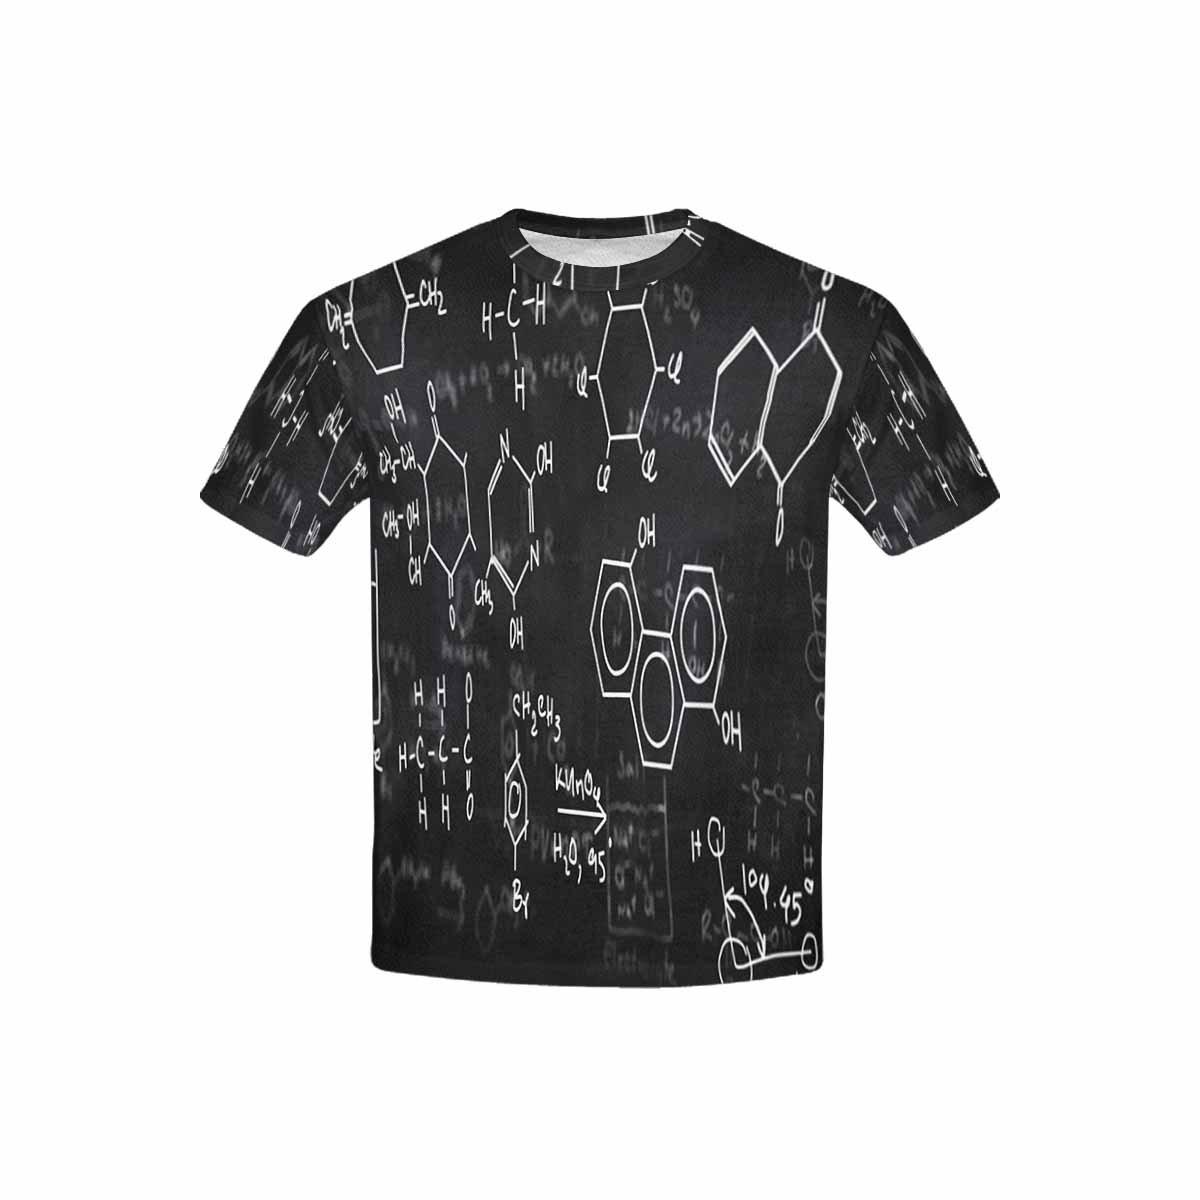 XS-XL INTERESTPRINT Youth T-Shirts Chemical Formulas